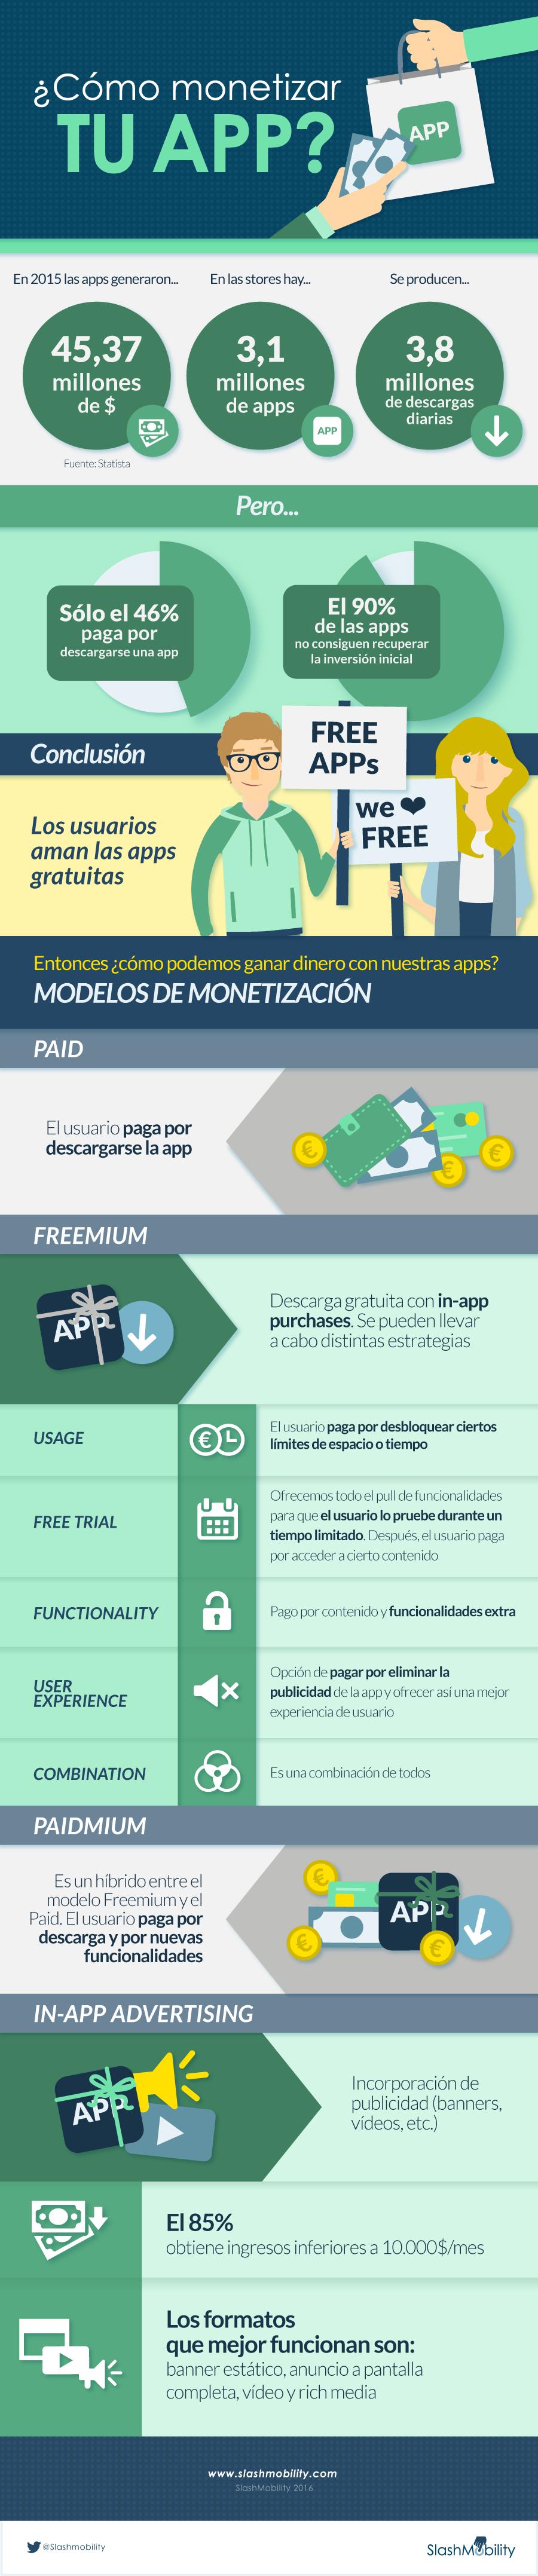 monetizar app infografia slashmobility